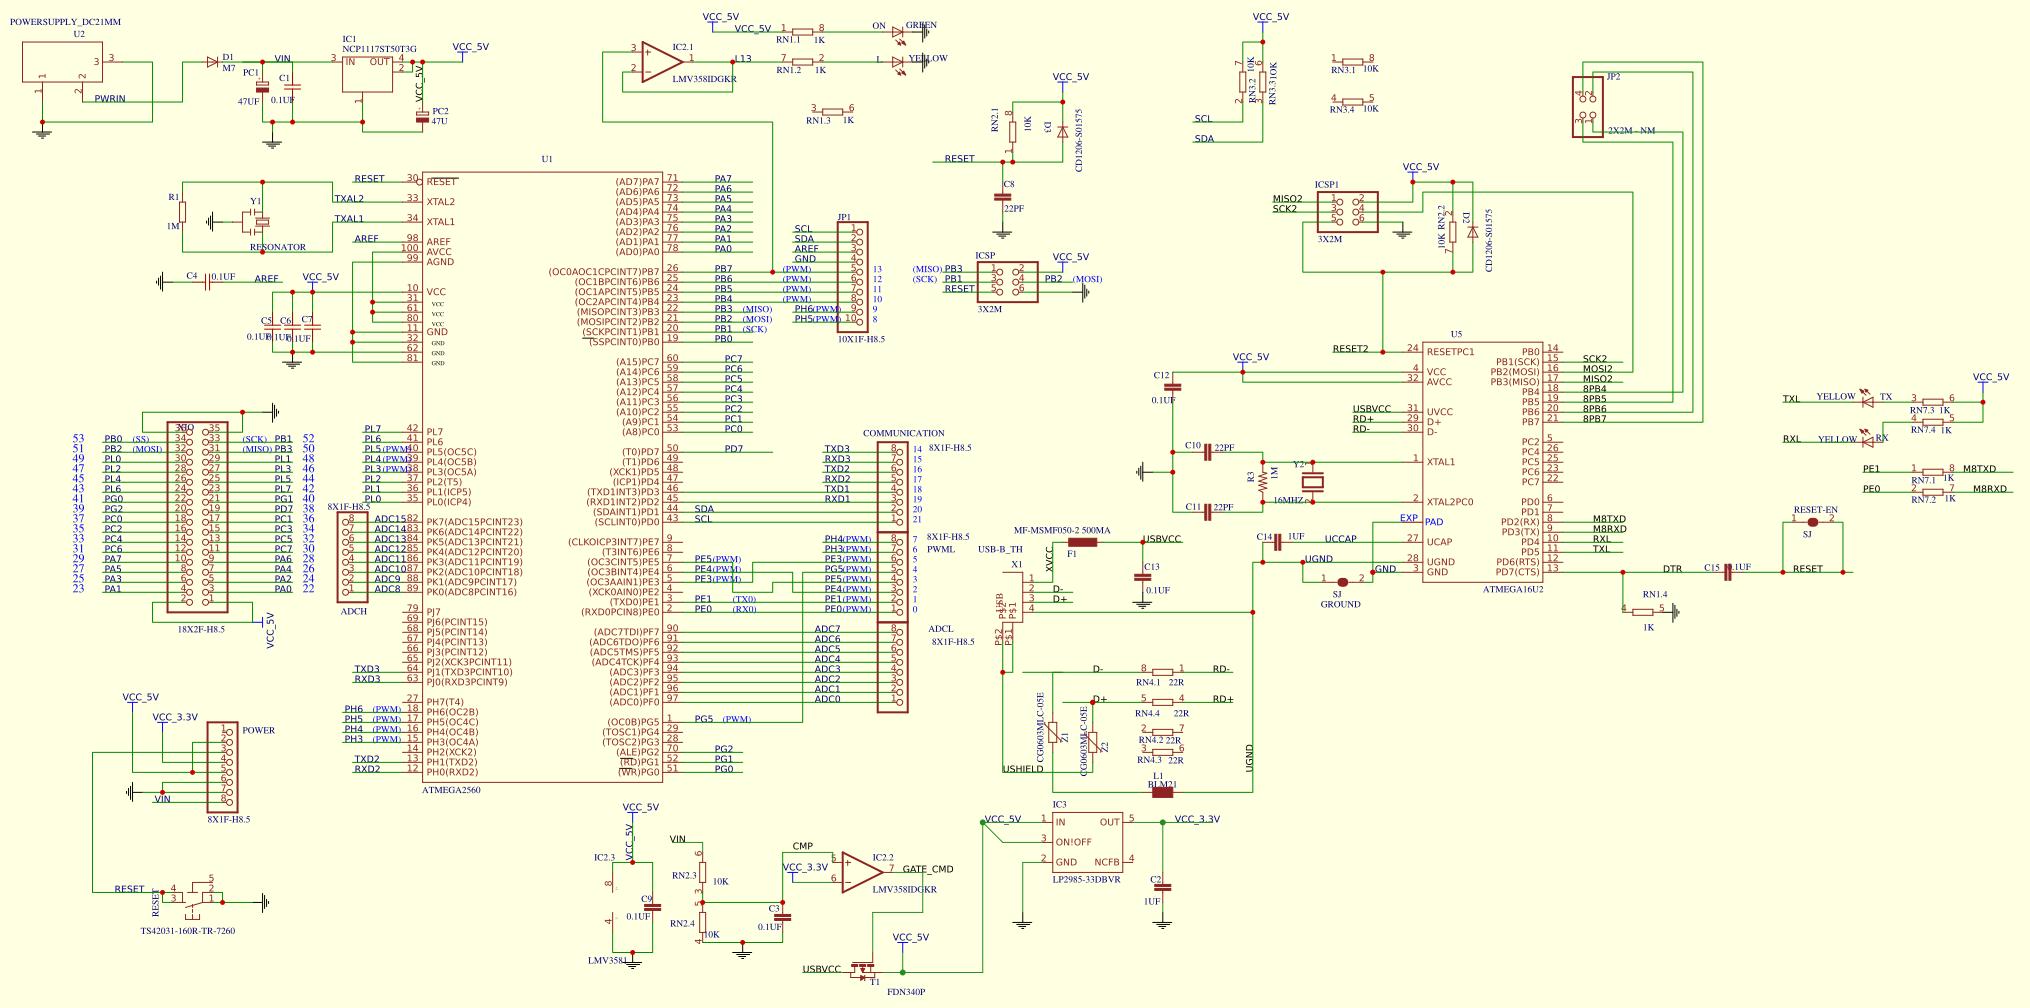 Arduino Mega 2560 schematic - EasA on arduino nano schematic, arduino mega 2560 map, arduino mega 2560 board, arduino speaker schematic, arduino mega 2560 led, arduino mega layout, arduino uno schematic, arduino mega adk, arduino mega 2560 programming, arduino schematic symbol, arduino mega 2560 pin mapping, arduino mega case, arduino mega size, arduino pro schematic, arduino mega specs, arduino microcontroller schematic, arduino mega 2560 datasheet, breadboard arduino schematic, arduino r3 schematic, arduino ethernet schematic,